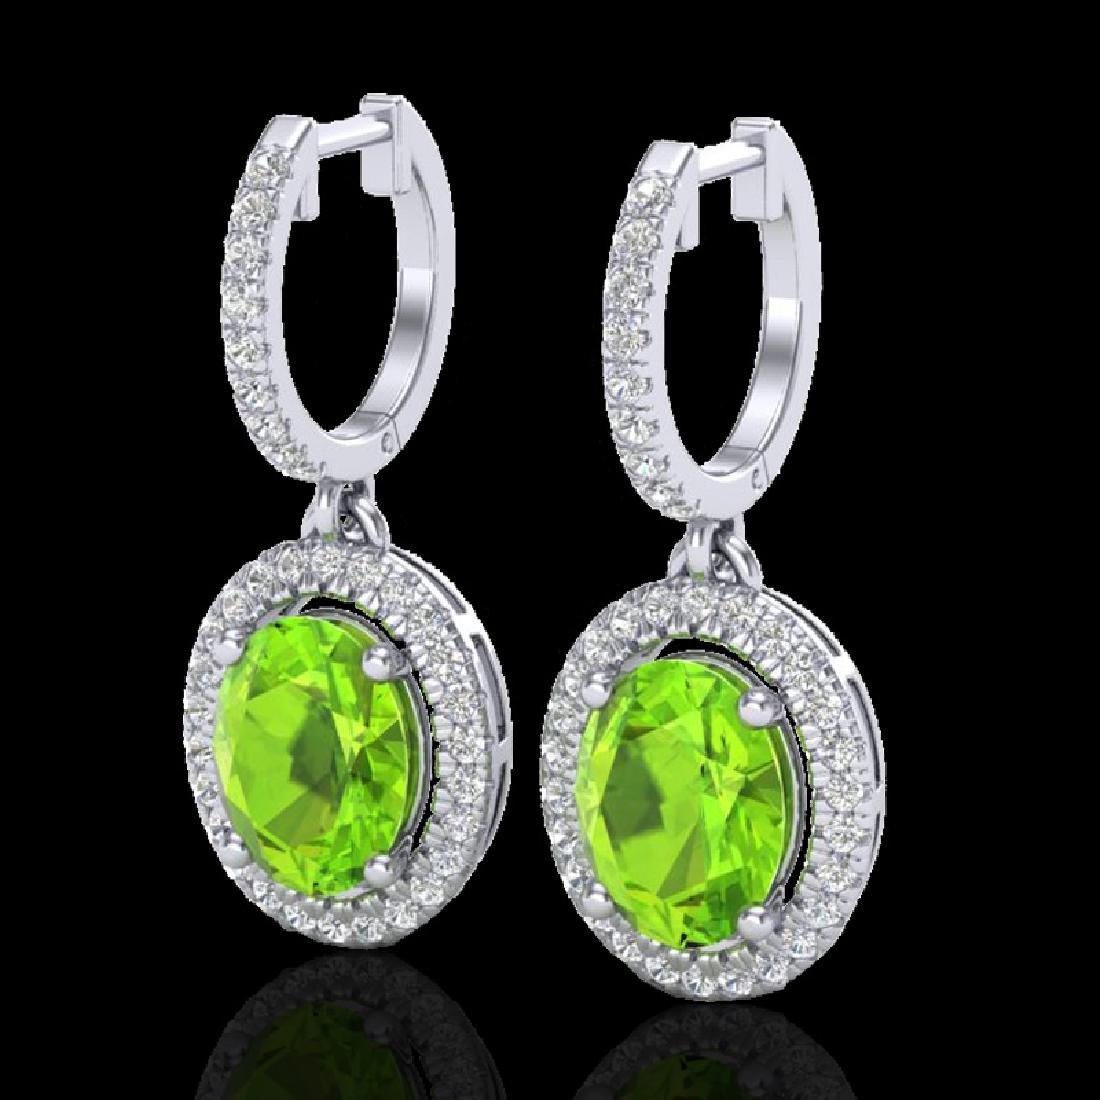 3.75 CTW Peridot & Micro Pave VS/SI Diamond Earrings